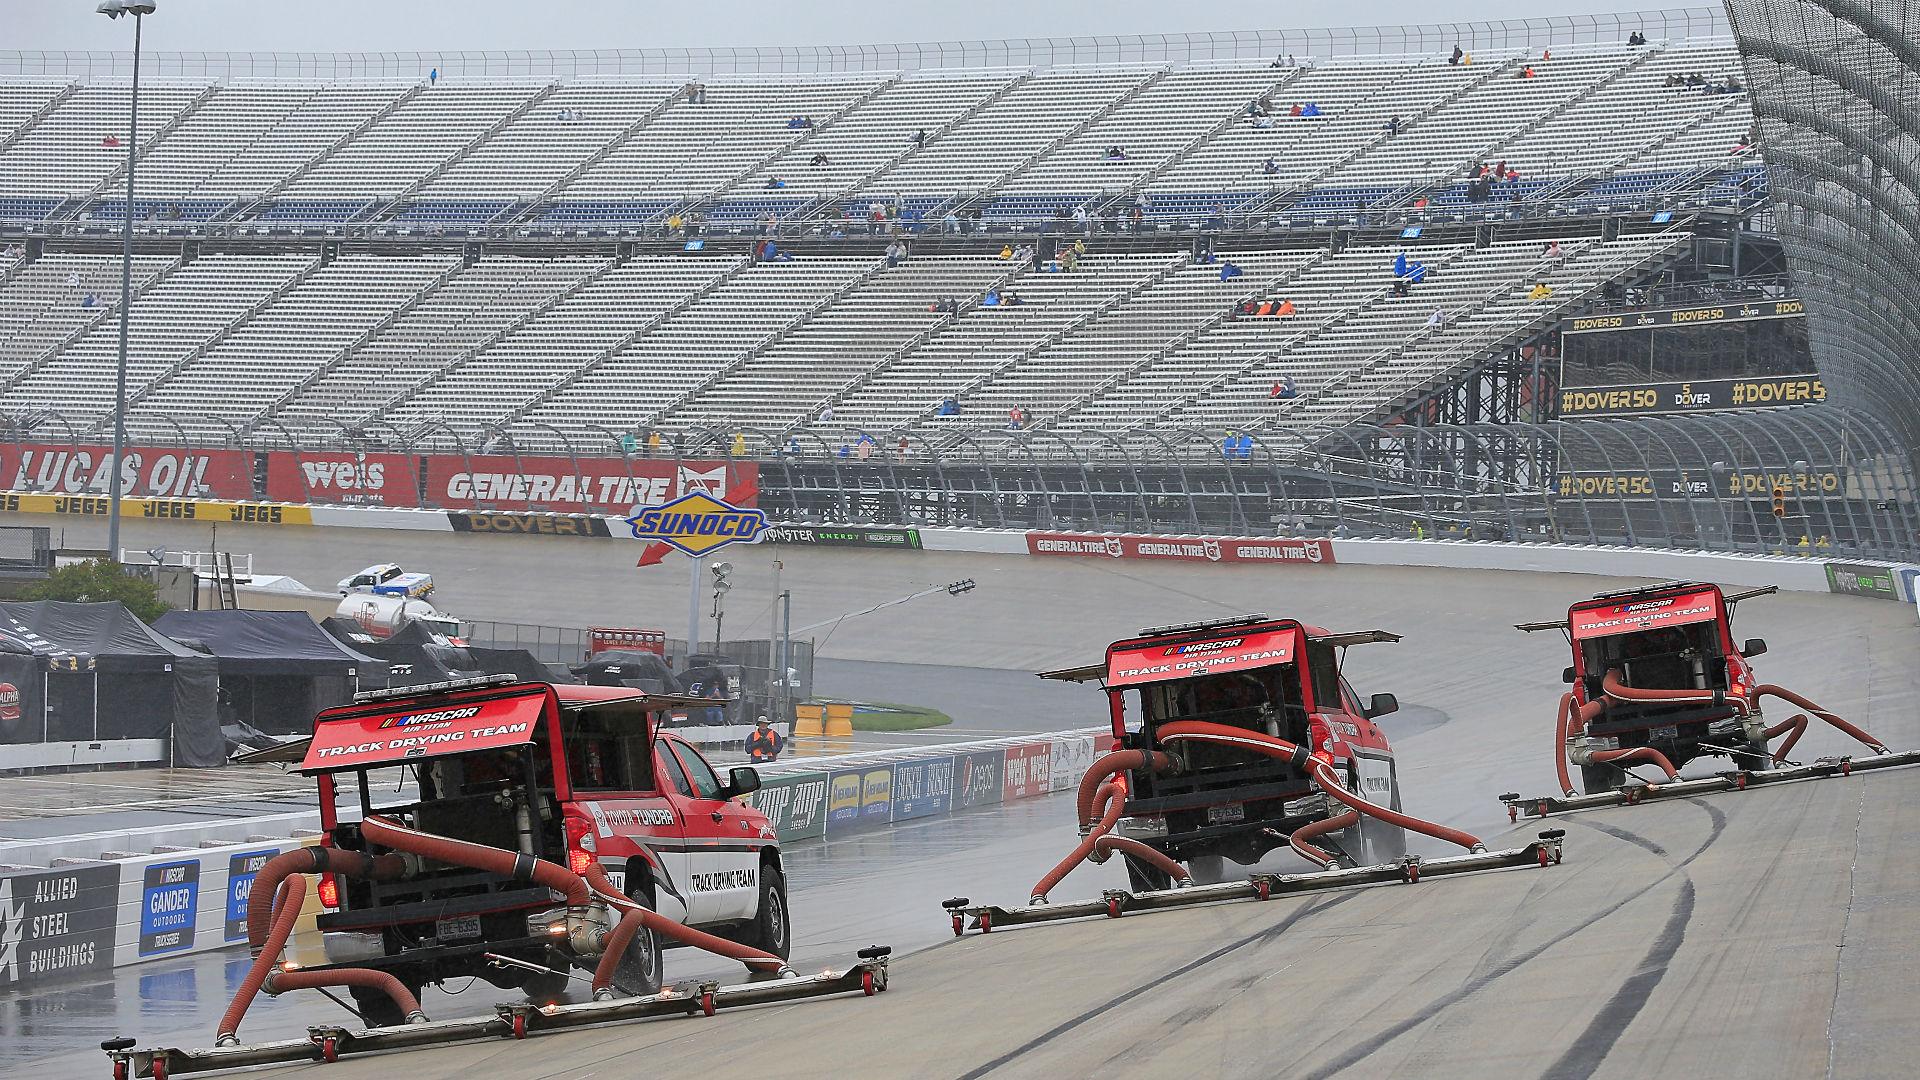 NASCAR at Dover: Rain postpones race to Monday